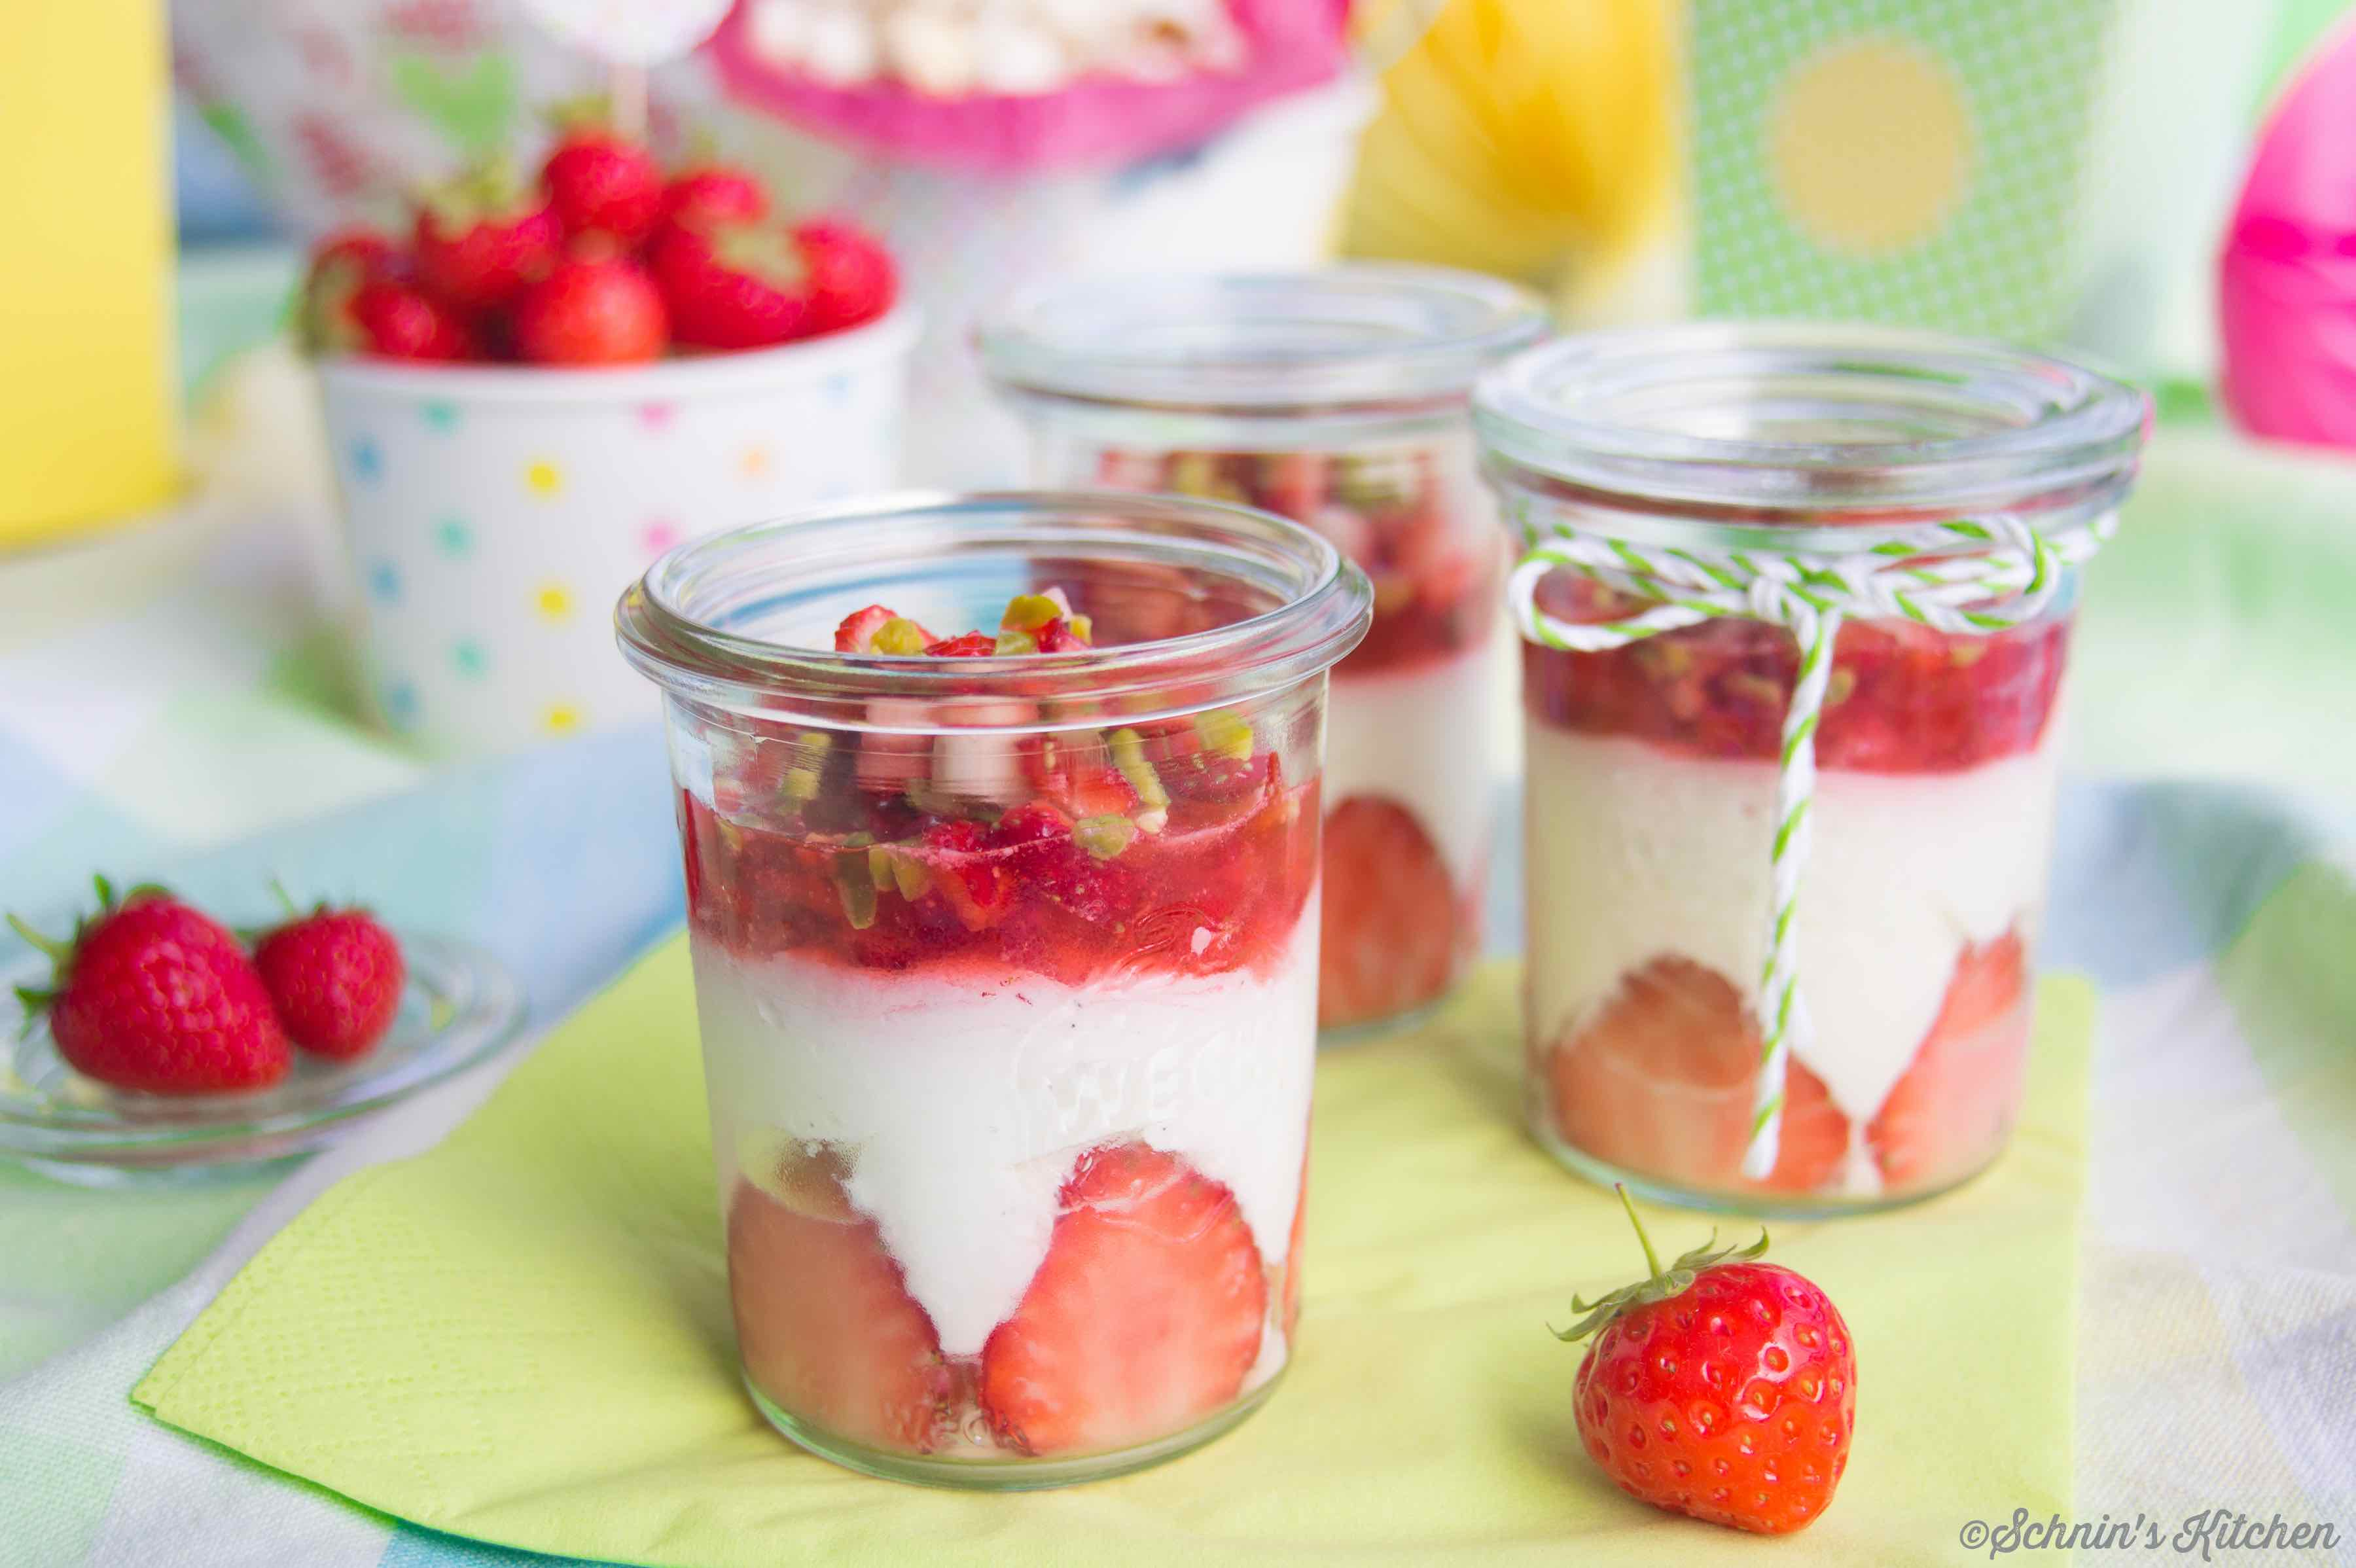 Erdbeer-Mascarpone-Creme